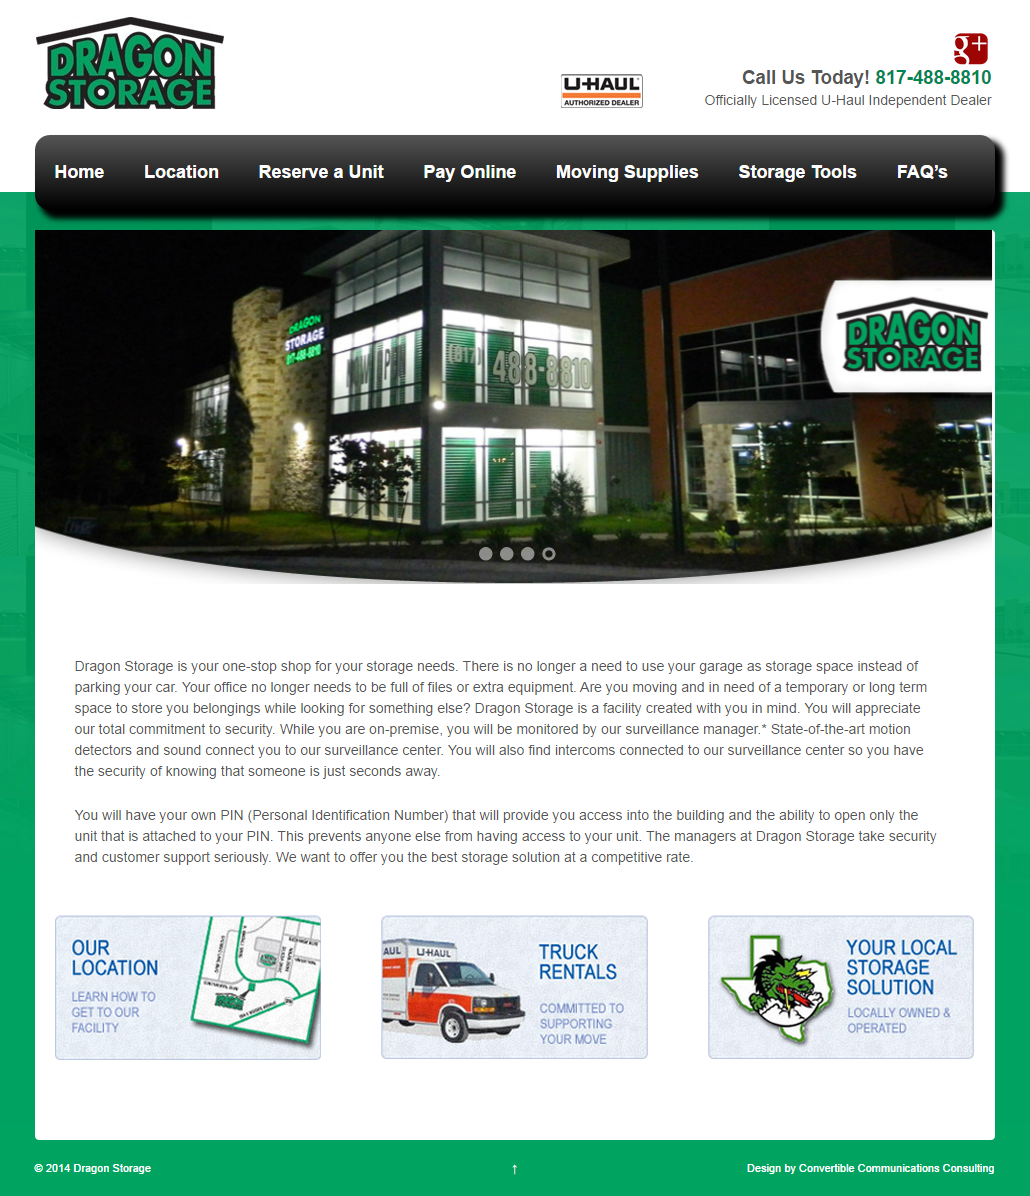 dragon storage southlake website design